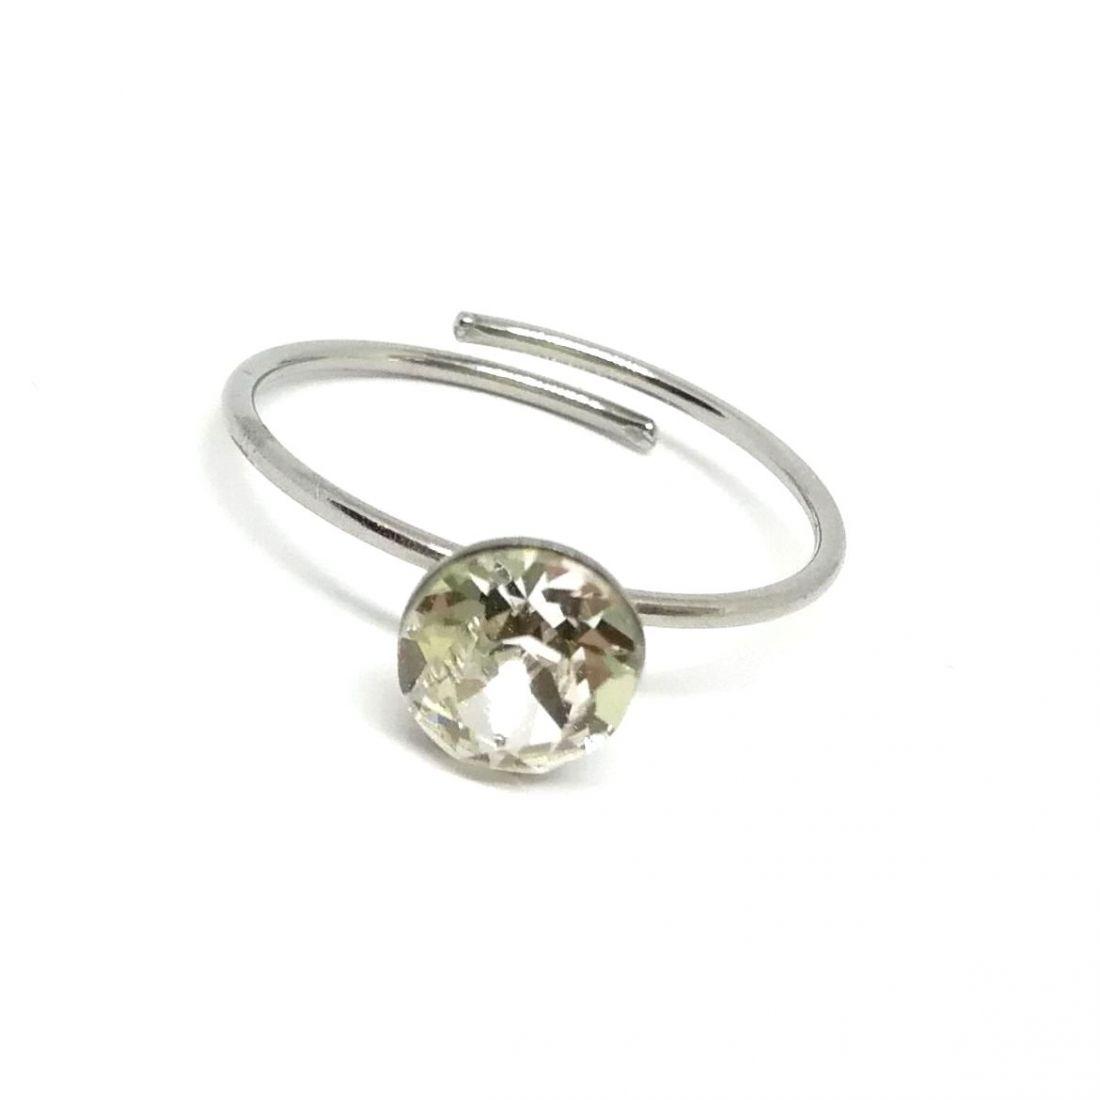 Egy köves gyűrű Swarovski® kristállyal díszítve